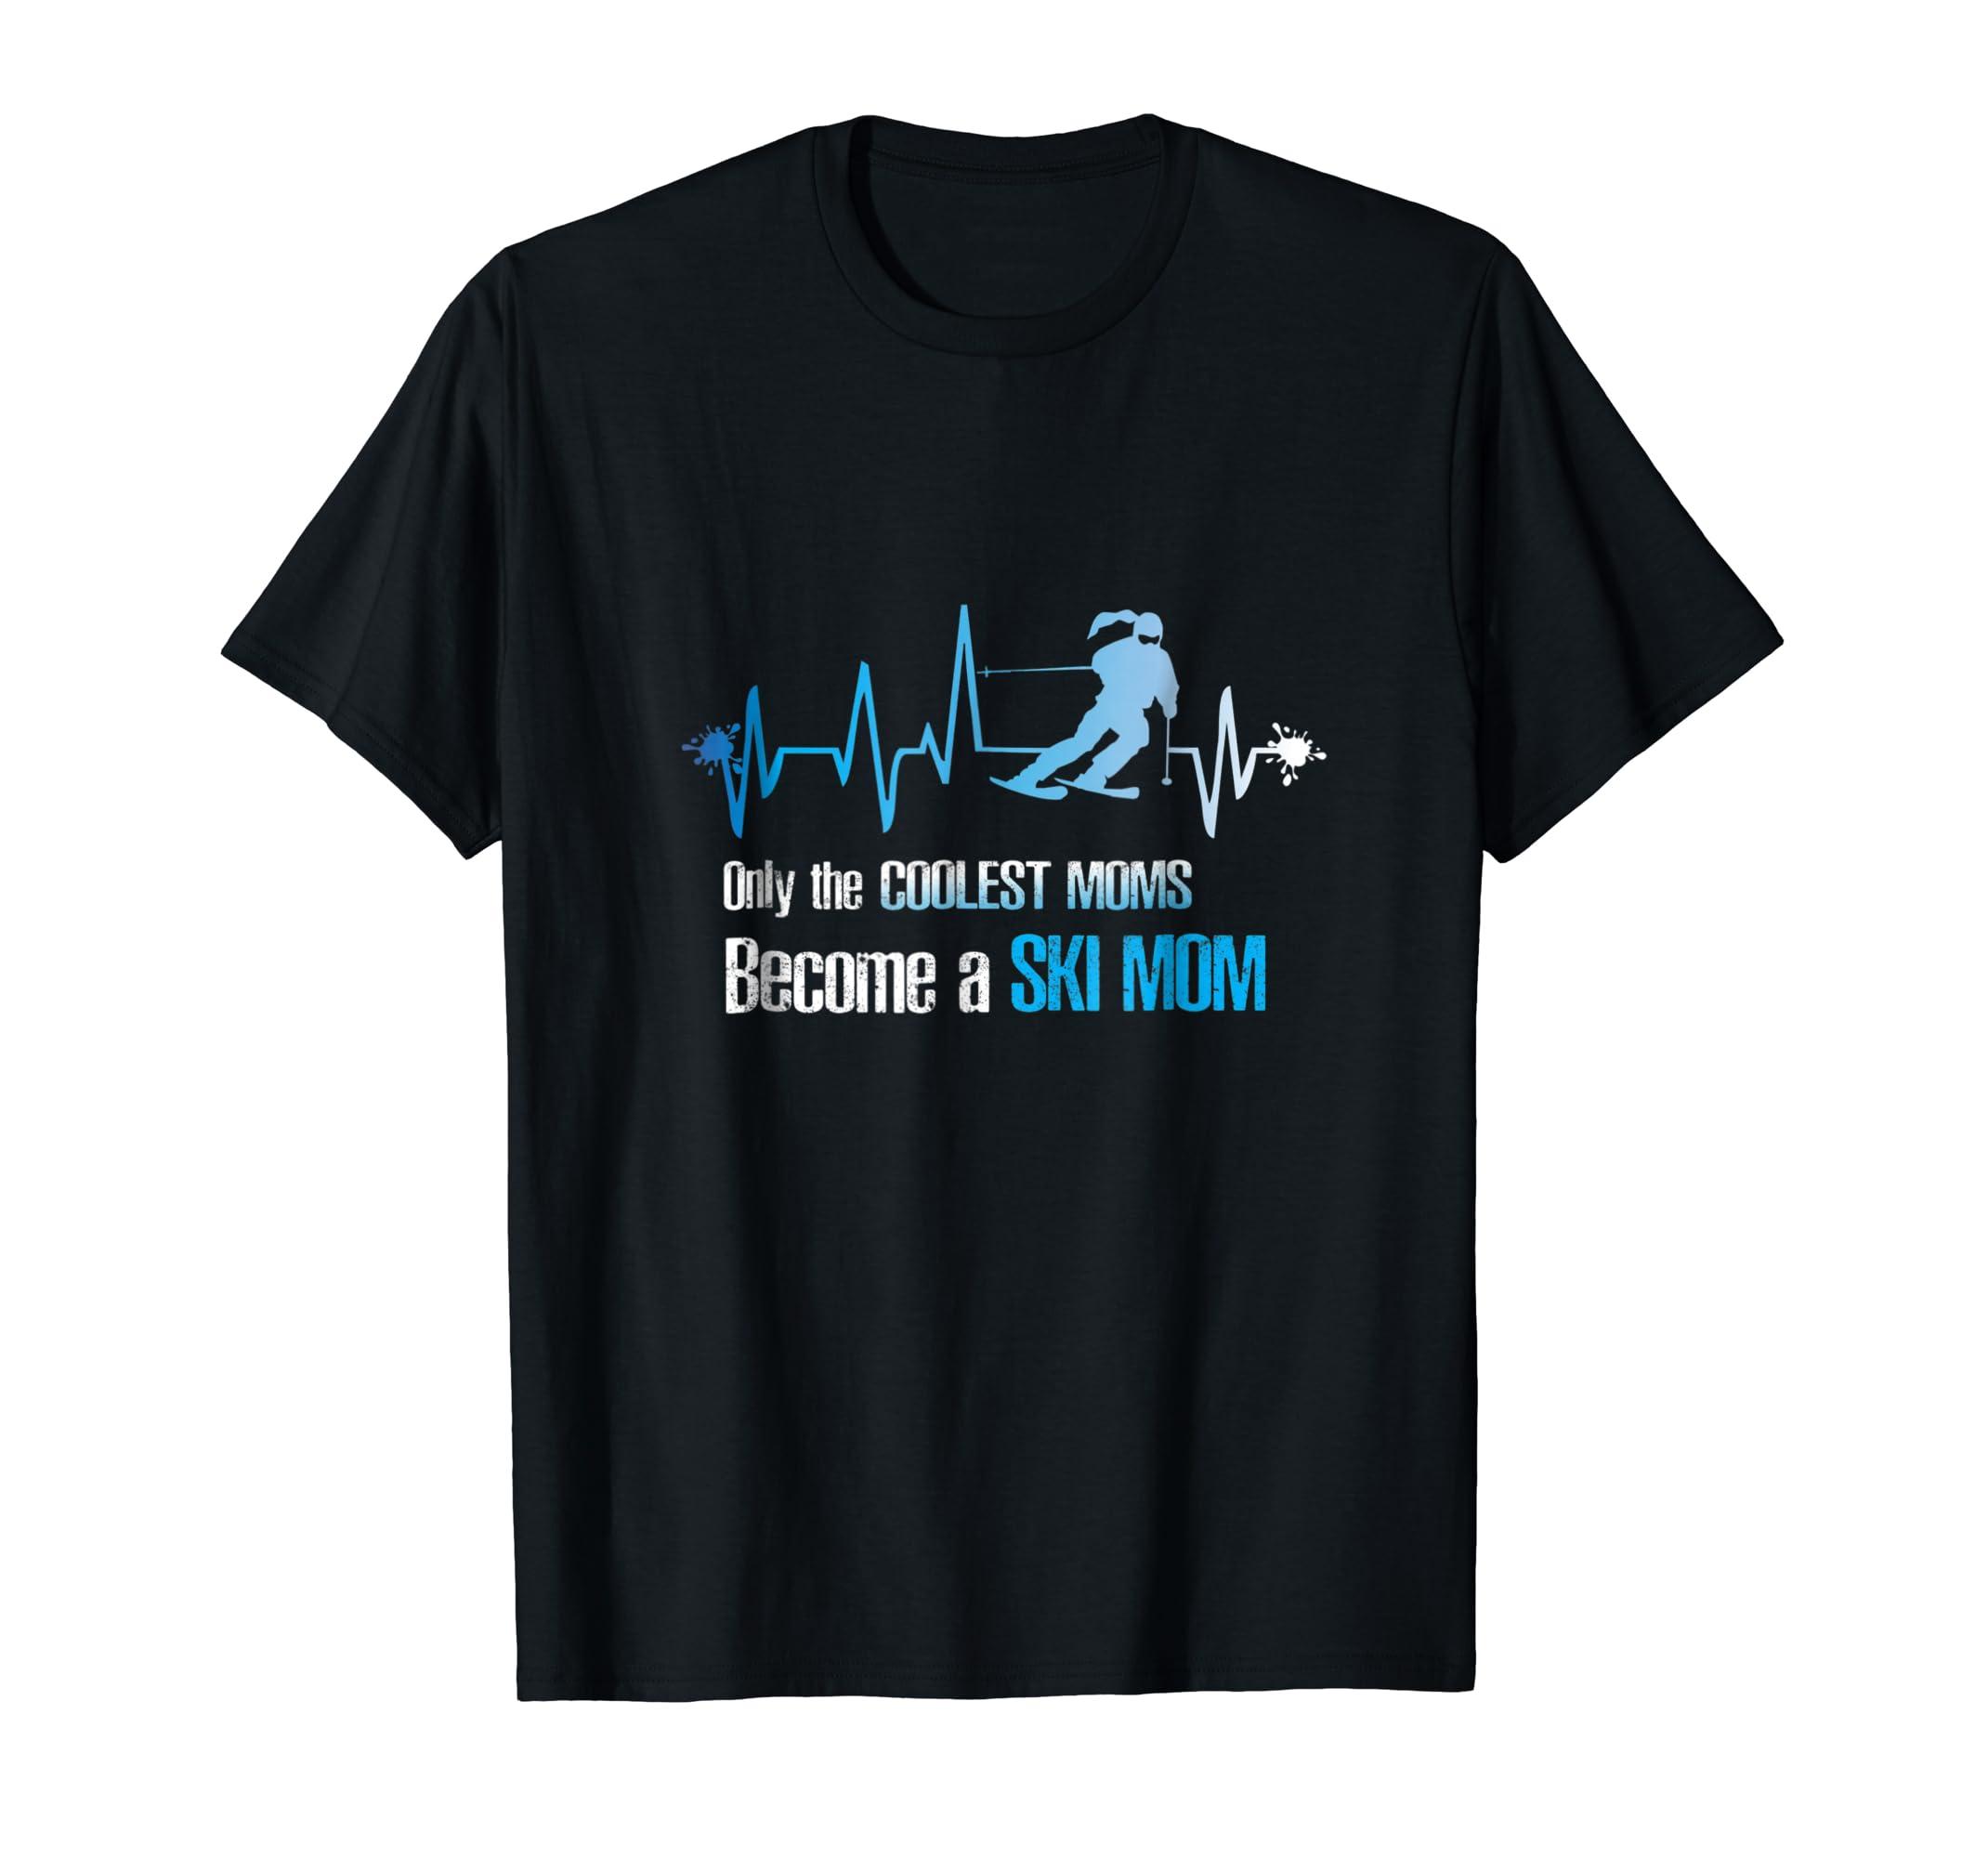 e7af58b2e6 Amazon.com: Ski Mom Shirt- Skier Gift Ideas -Funny ski shirts womens tee:  Clothing